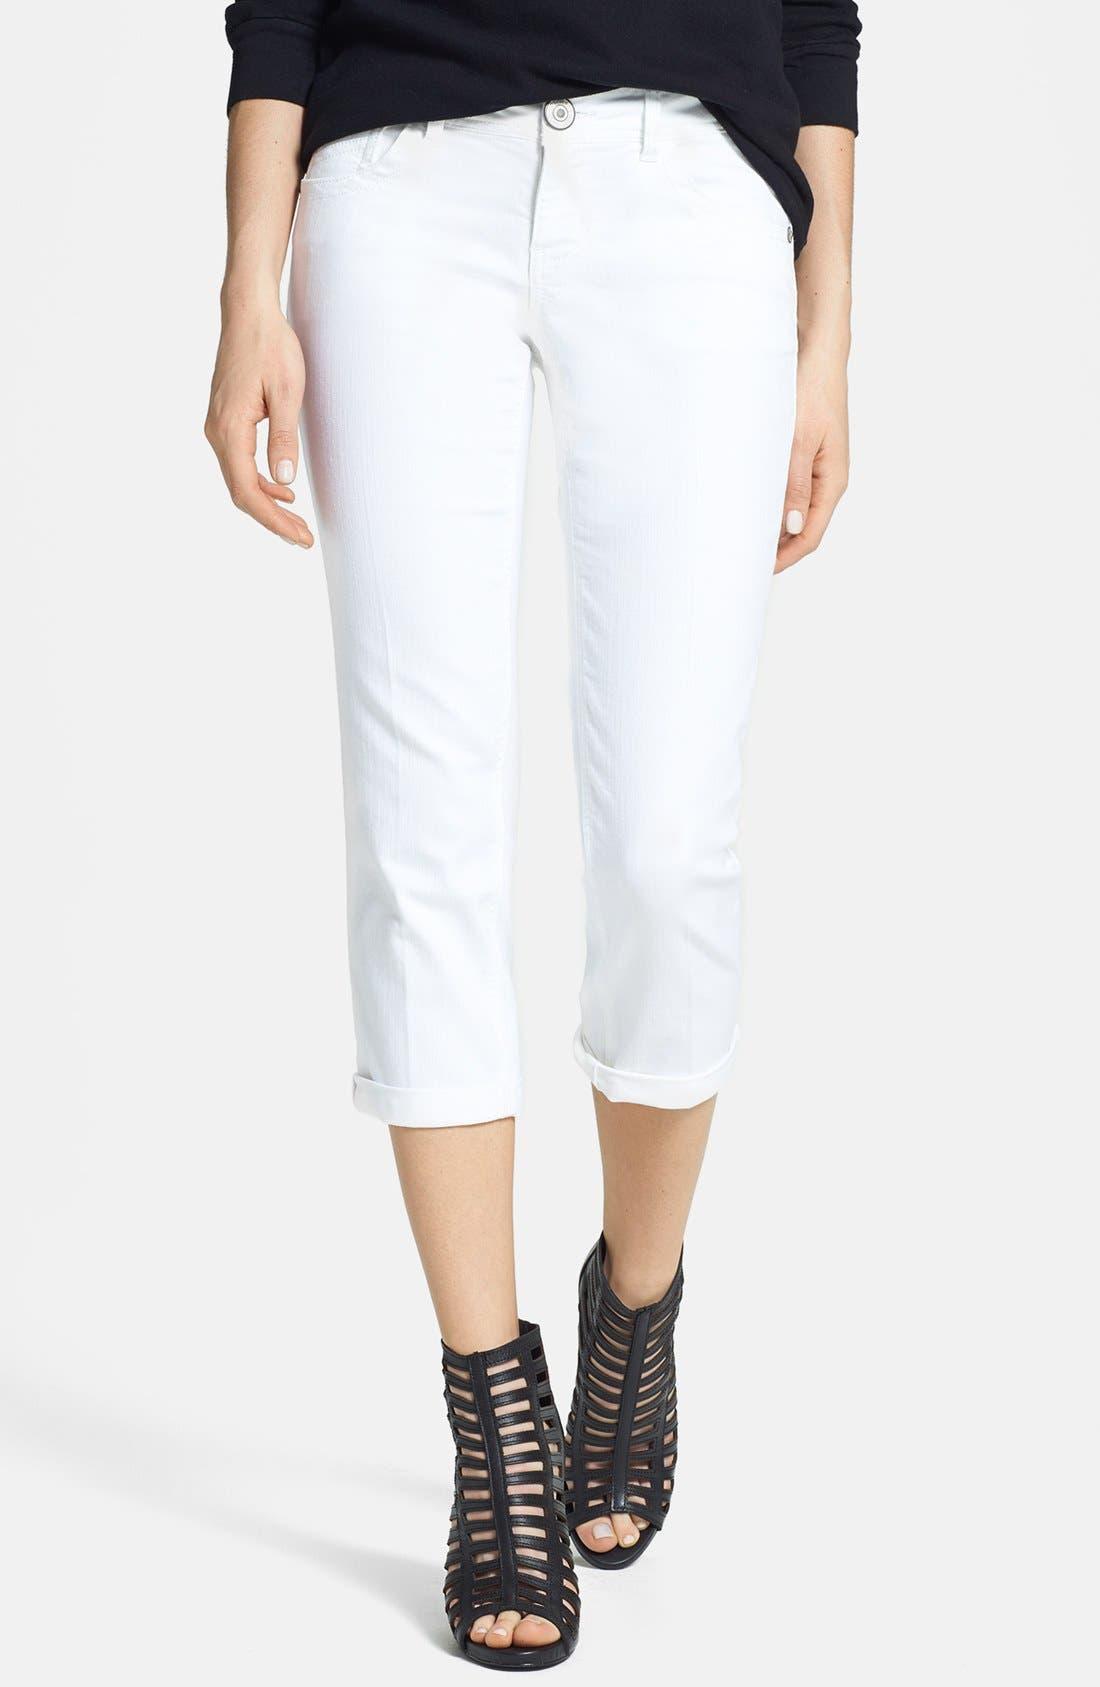 Main Image - Jolt Crop Jeans (White) (Juniors) (Online Only)